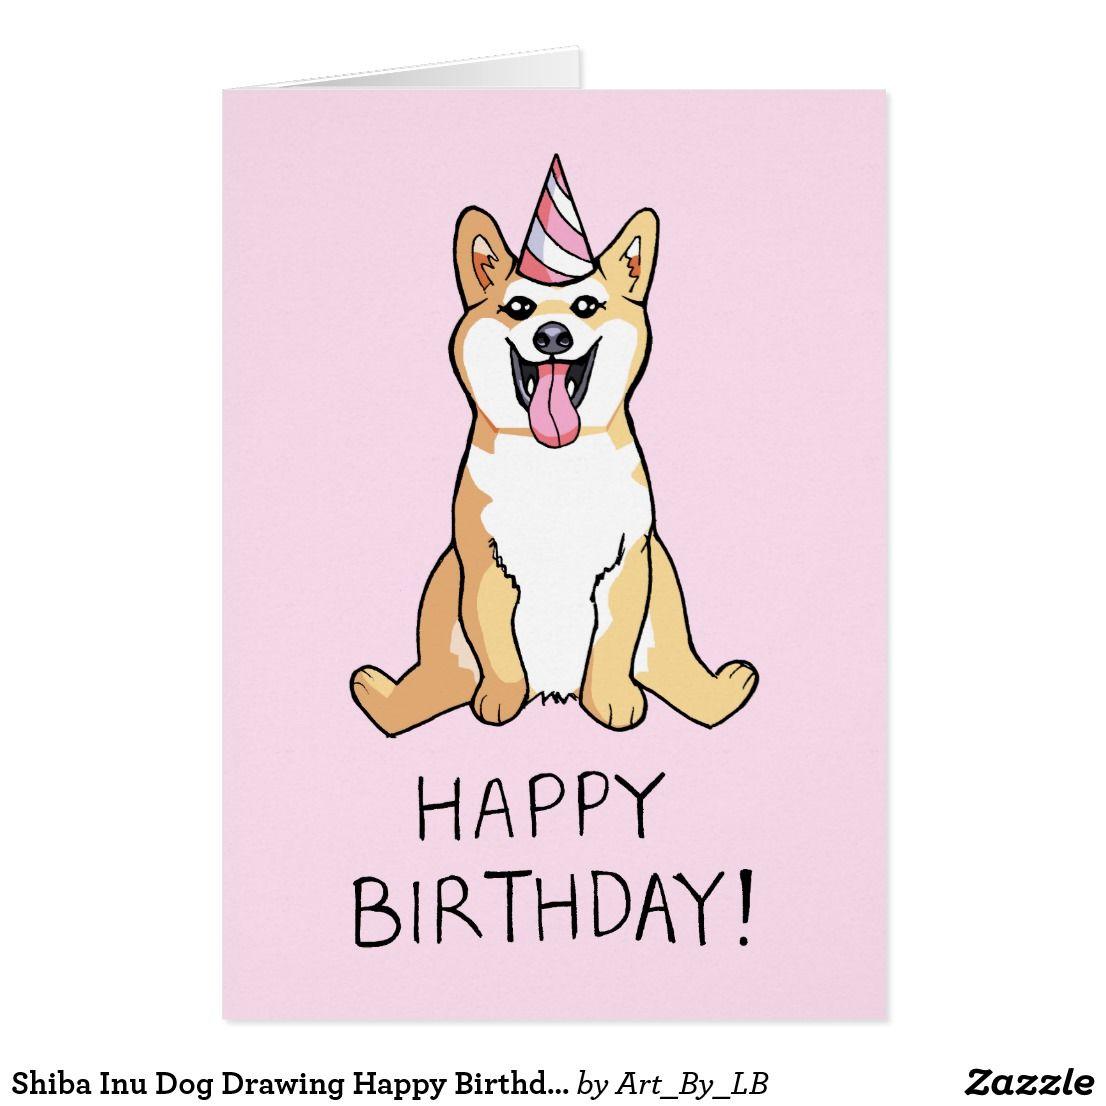 Shiba Inu Dog Drawing Happy Birthday Card Zazzle Com In 2020 Happy Birthday Drawings Dog Birthday Card Birthday Card Drawing